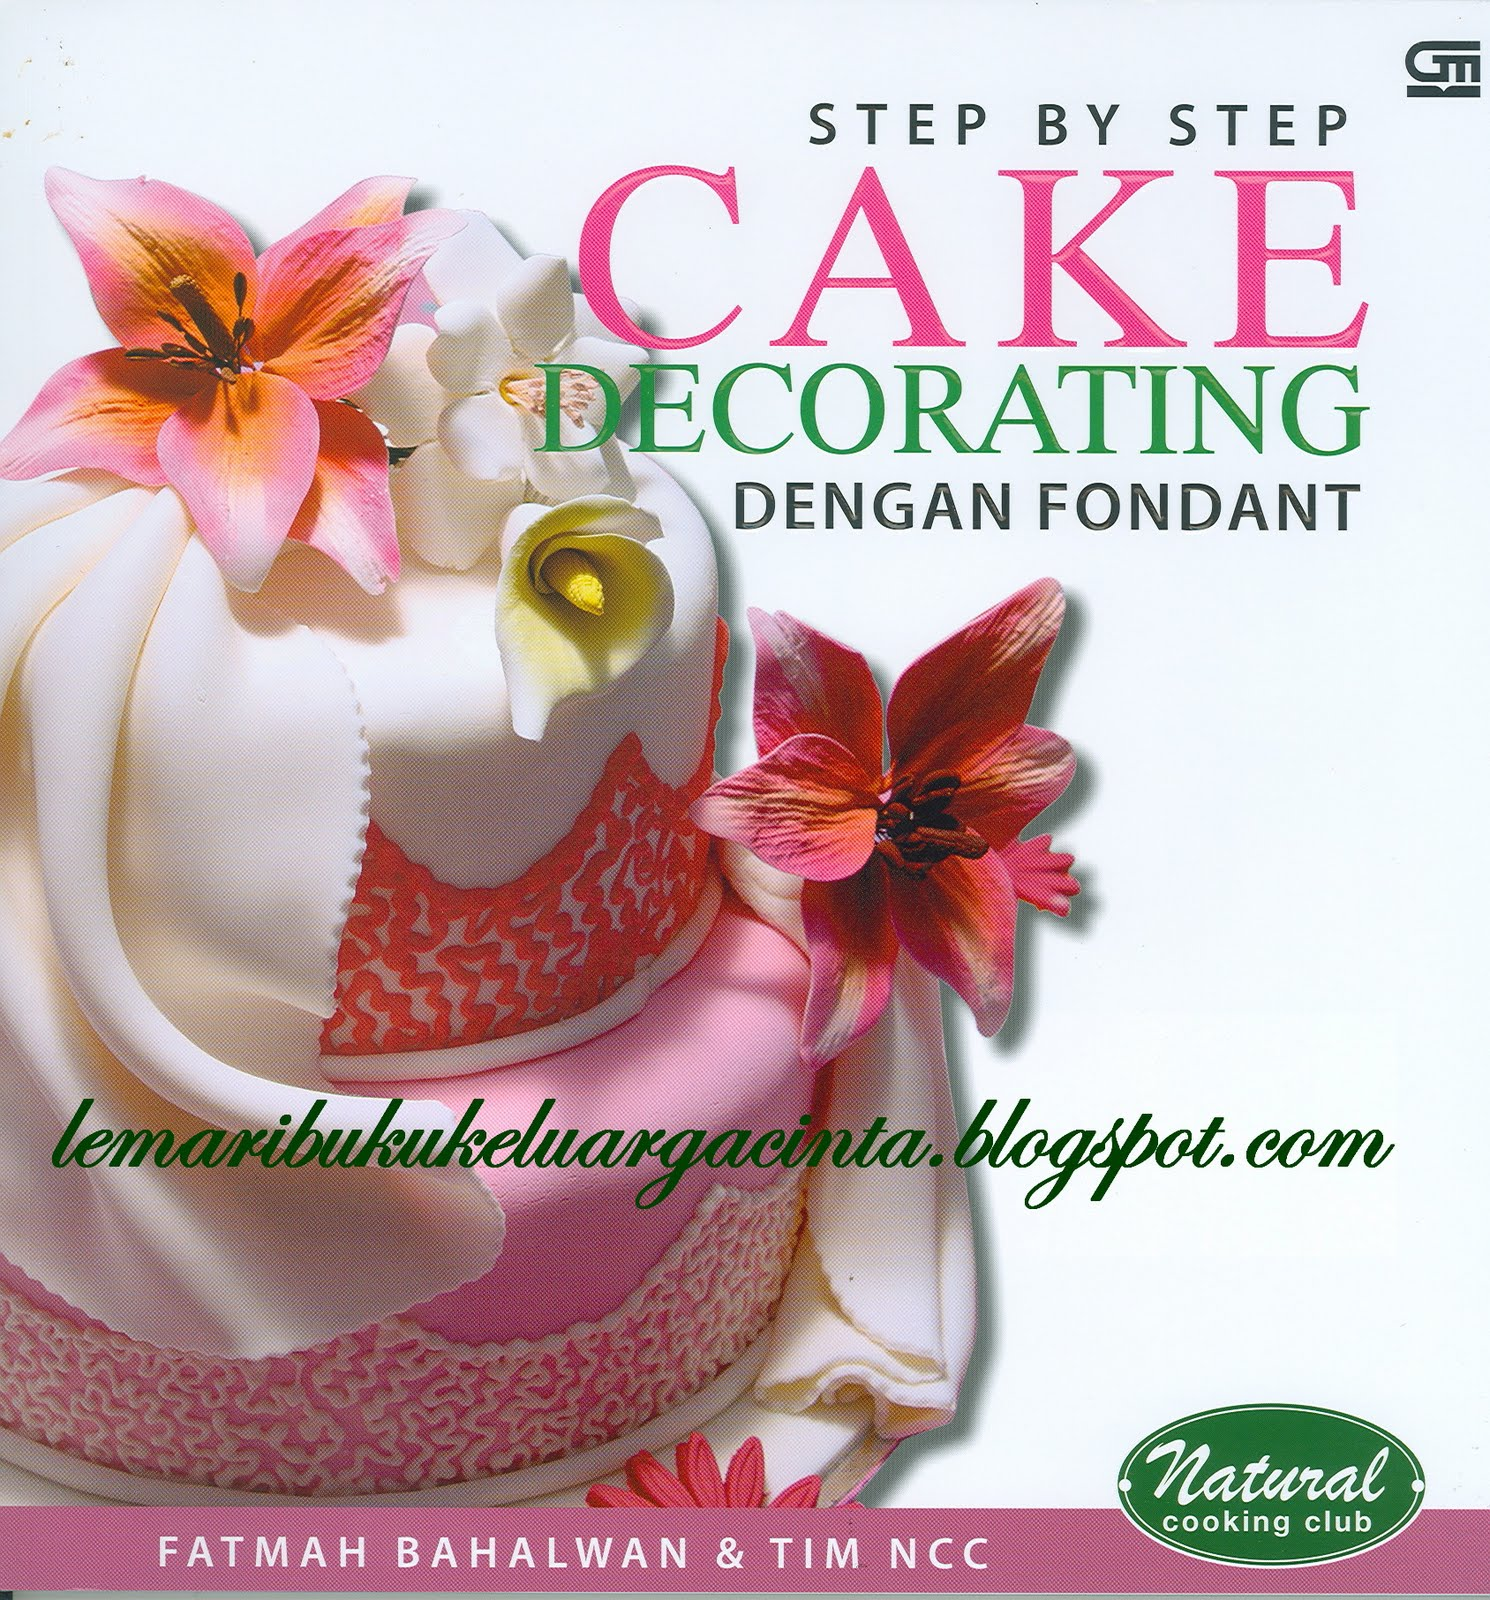 Step By Step Cake Decorating Dengan Fondant